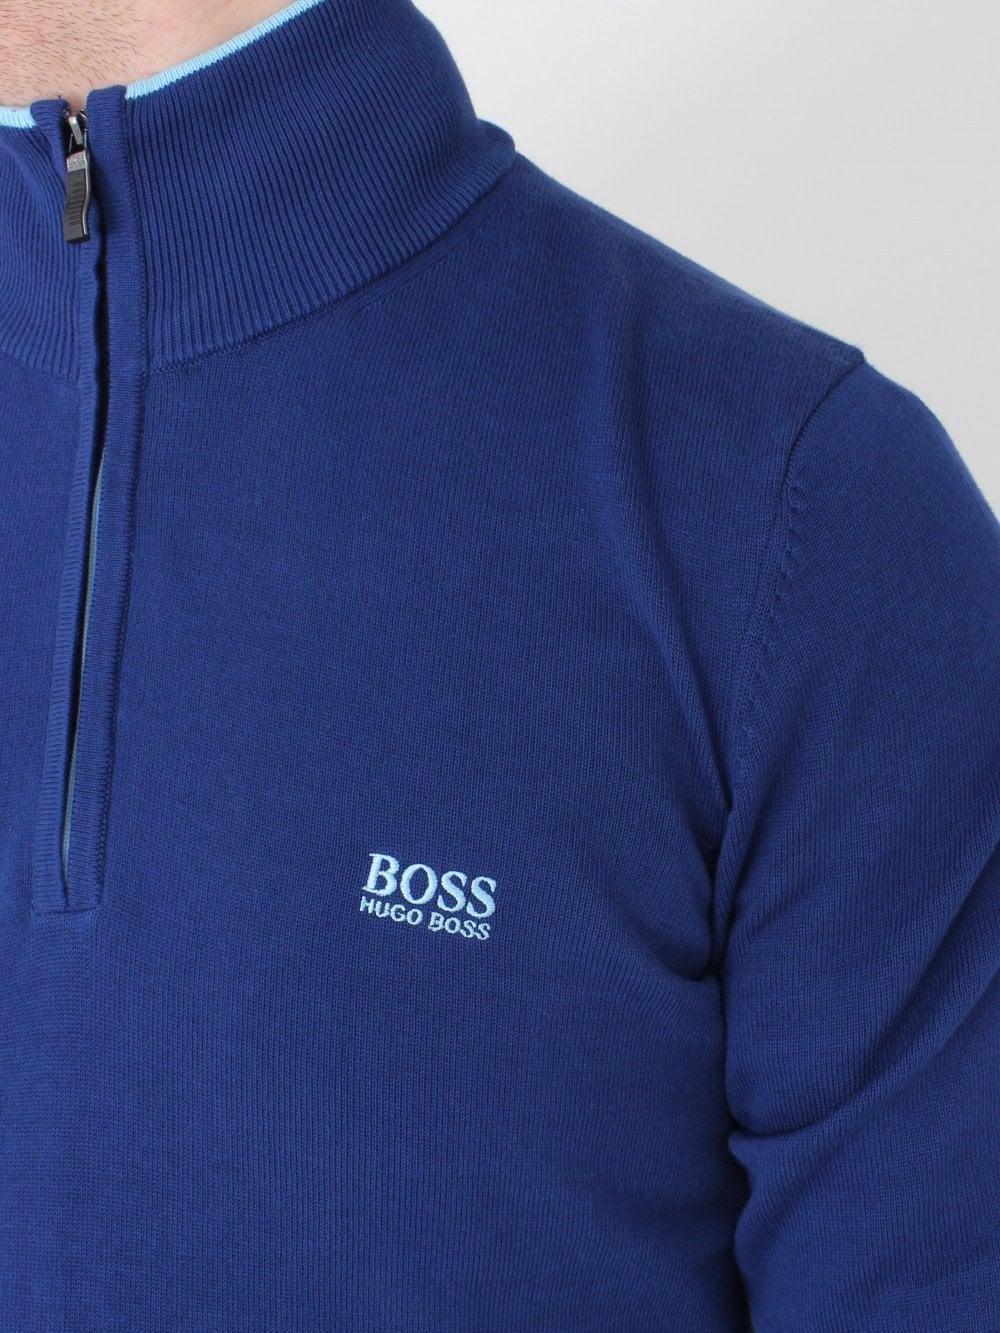 8f458ad2f Hugo Boss Zimex 1/4 Zip Knit in Dark Blue | Northern Threads